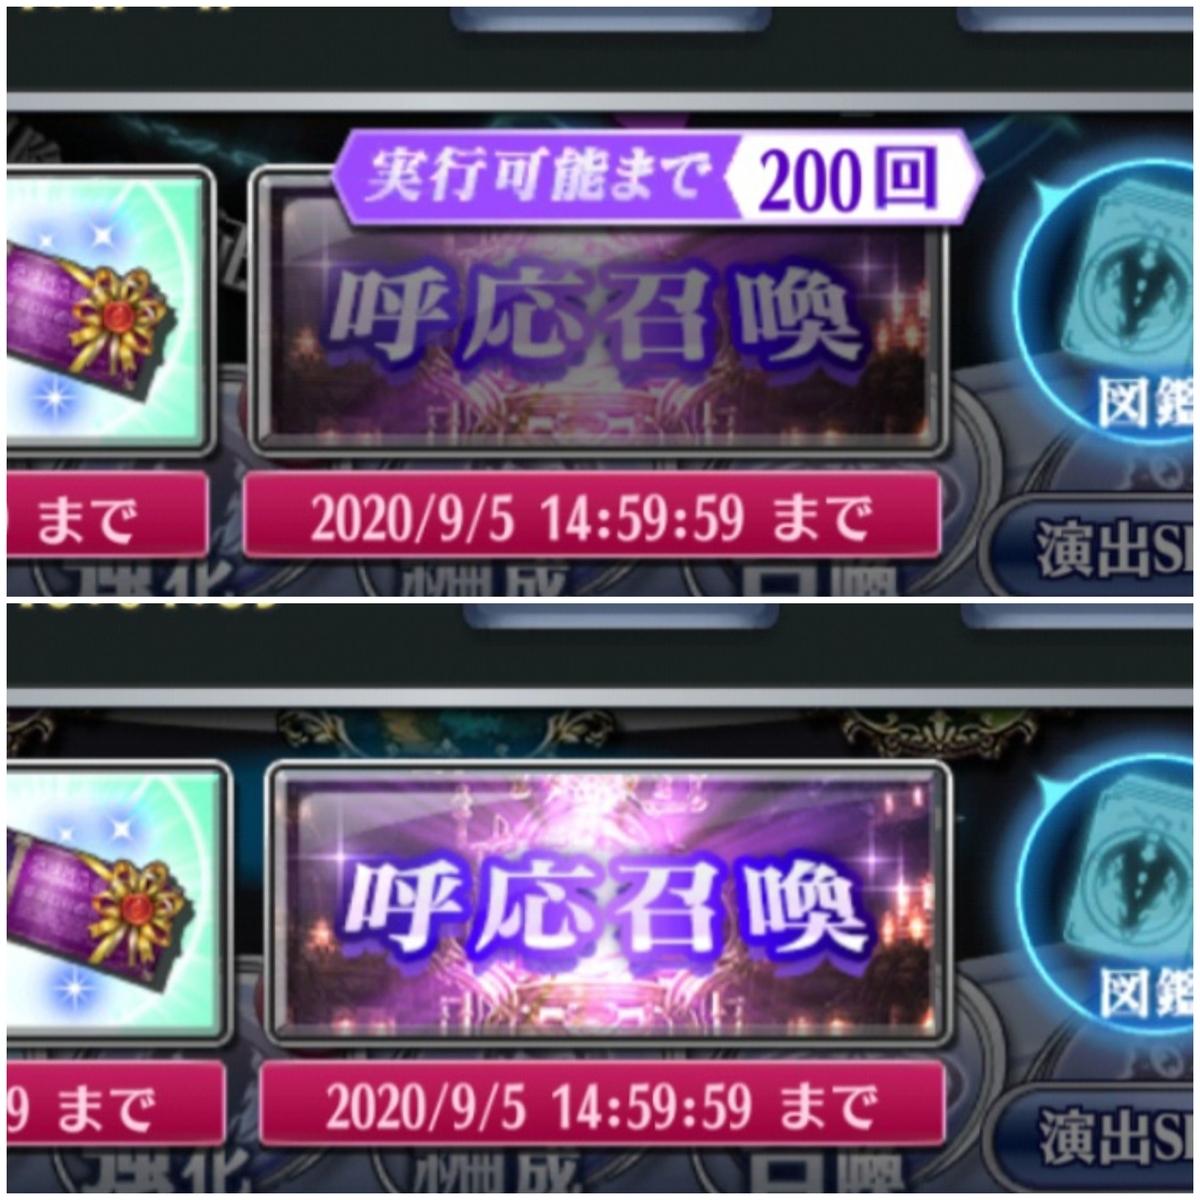 f:id:Nanaki-Nanashino:20210327011936j:plain